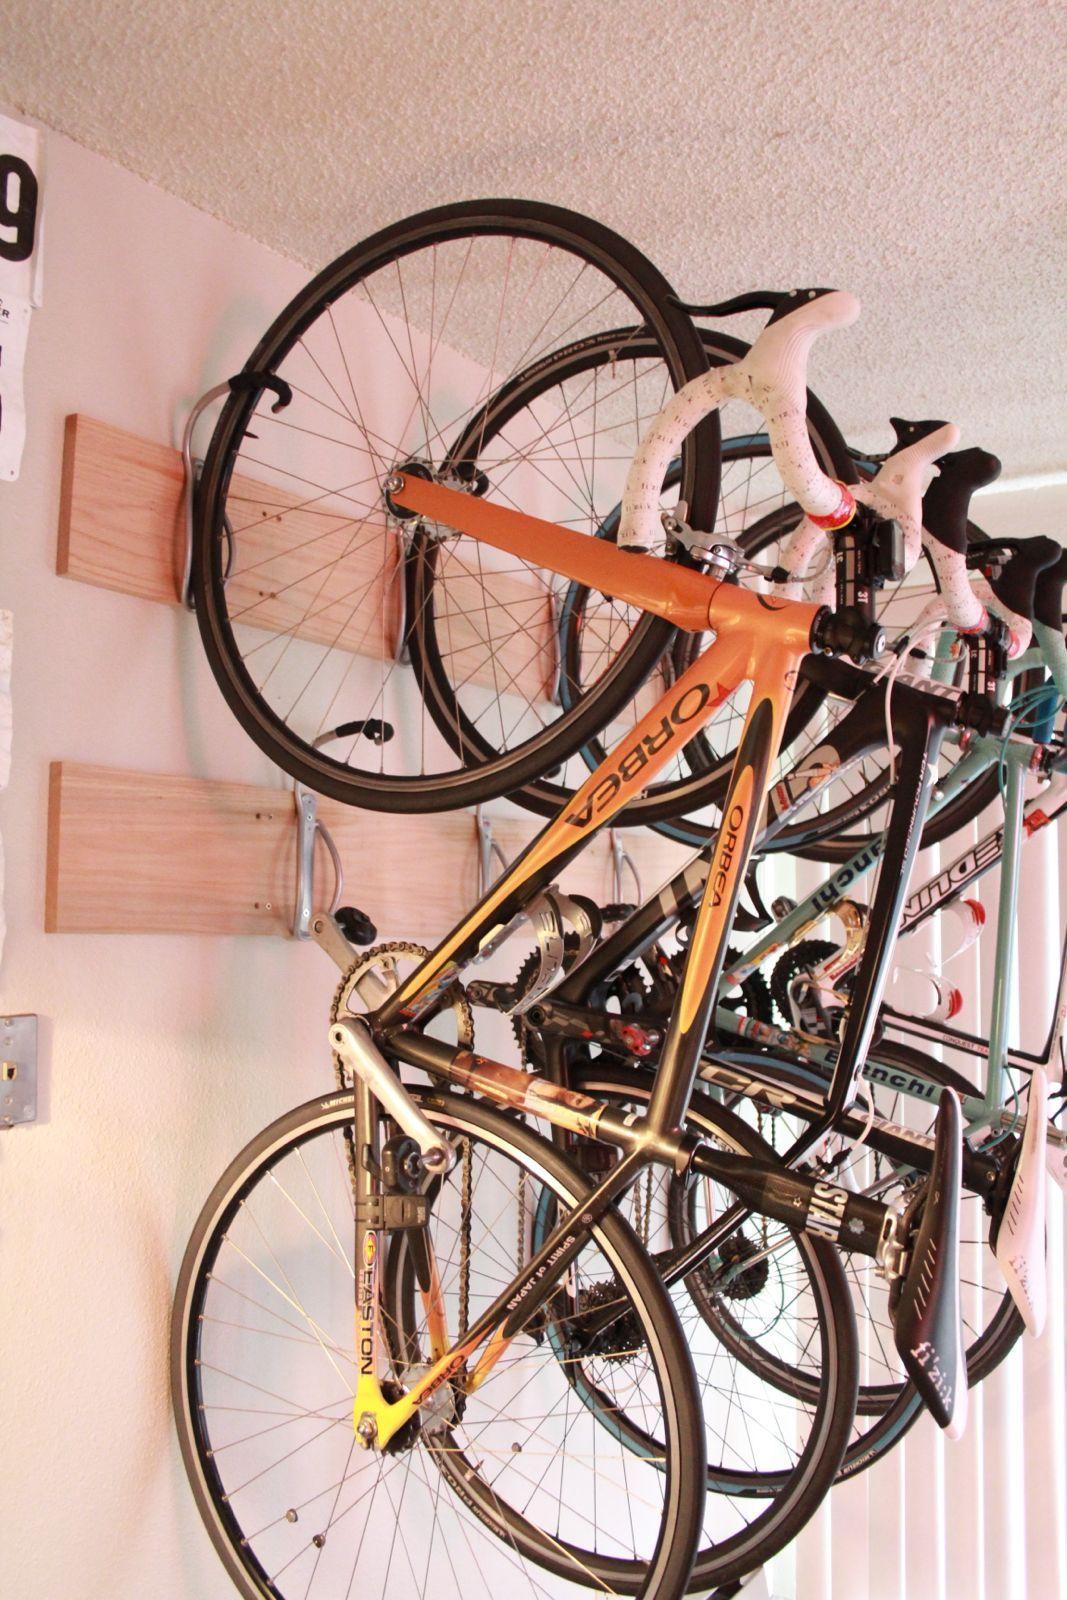 Hang Bikes In The Garage Check Hanging Bike Rack Bike